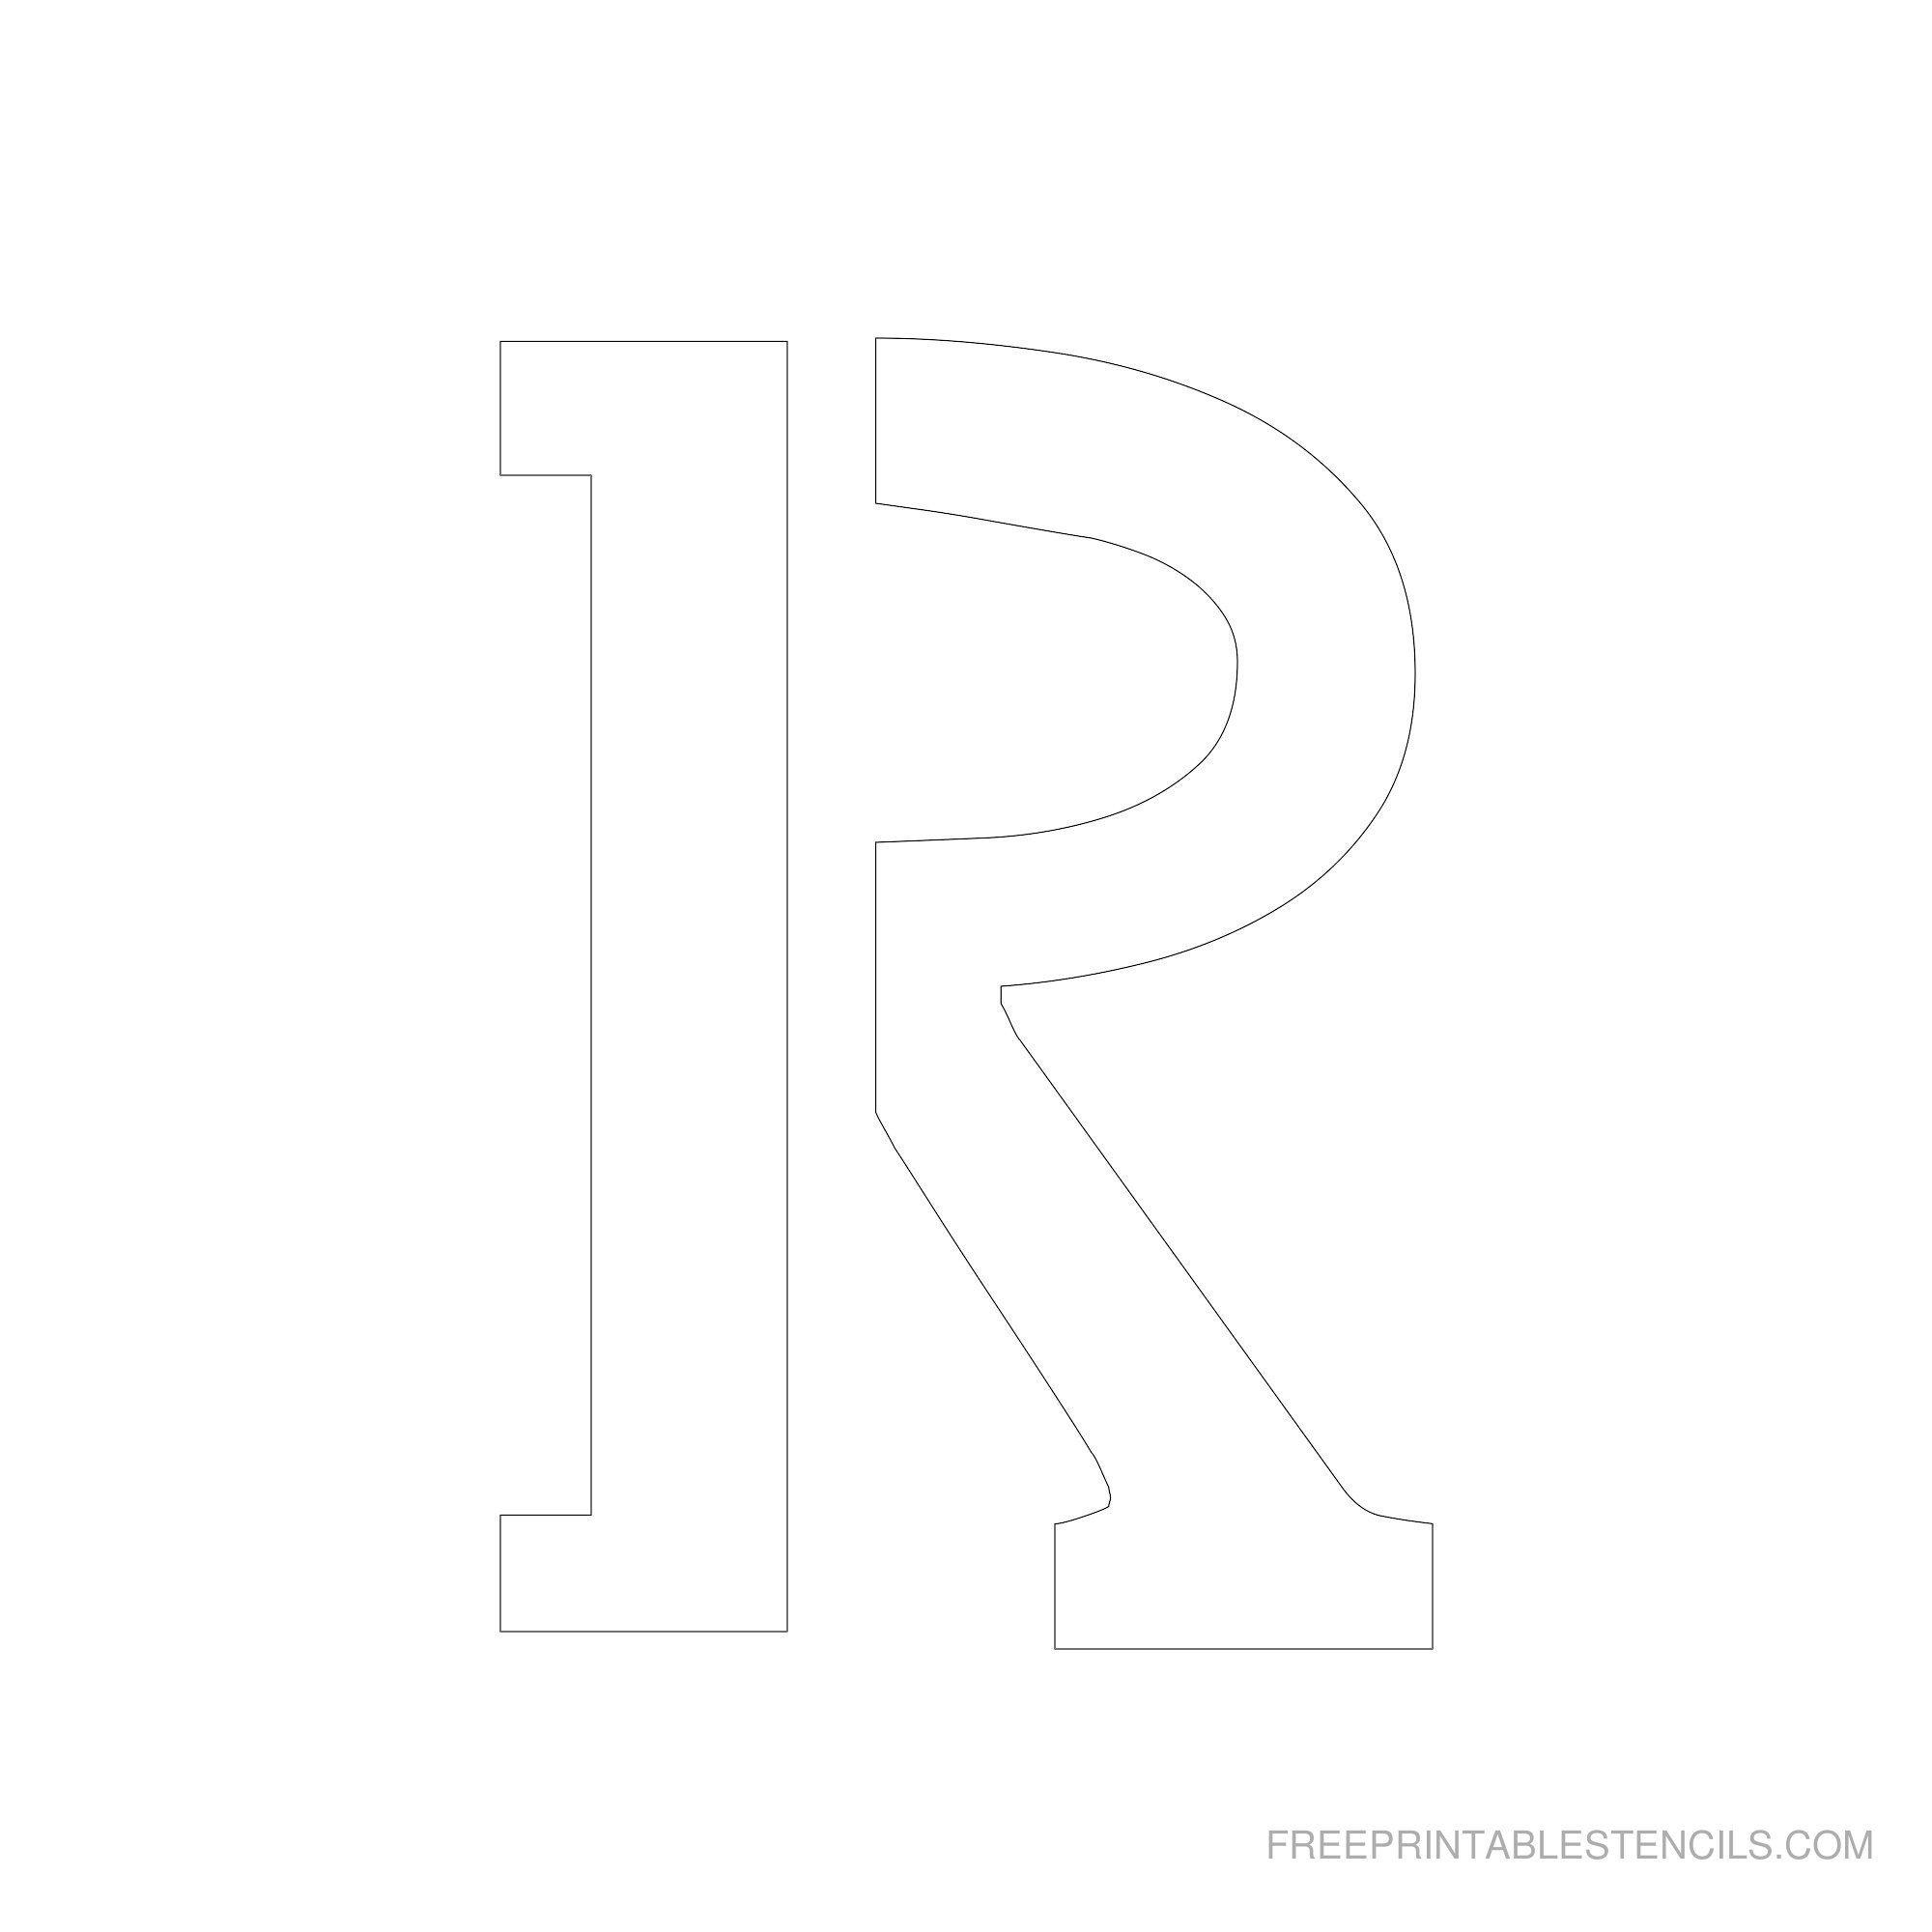 Free Printable Letter Stencils | Free Printable 6 Inch Alphabet - Free Printable Letter Stencils